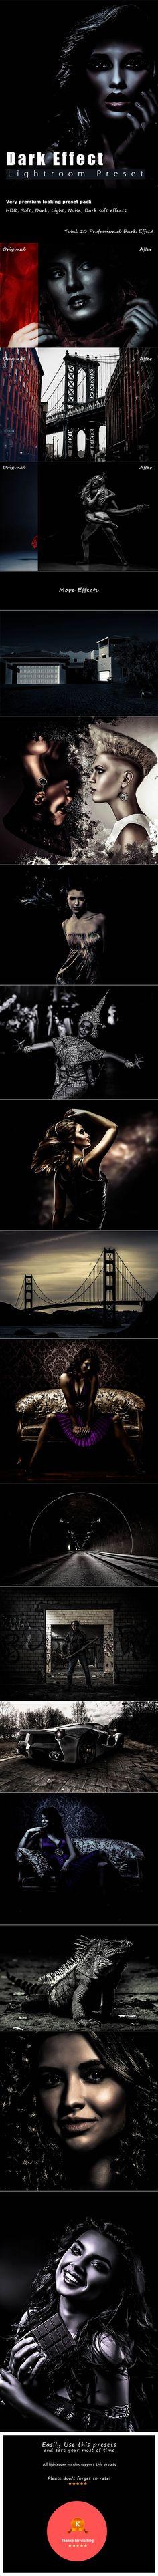 20 Dark Effect Lightroom Presets — LRTemplate #Retro Lightroom Presets #matte effect • Download ➝ https://graphicriver.net/item/20-dark-effect-lightroom-presets/19730085?ref=pxcr